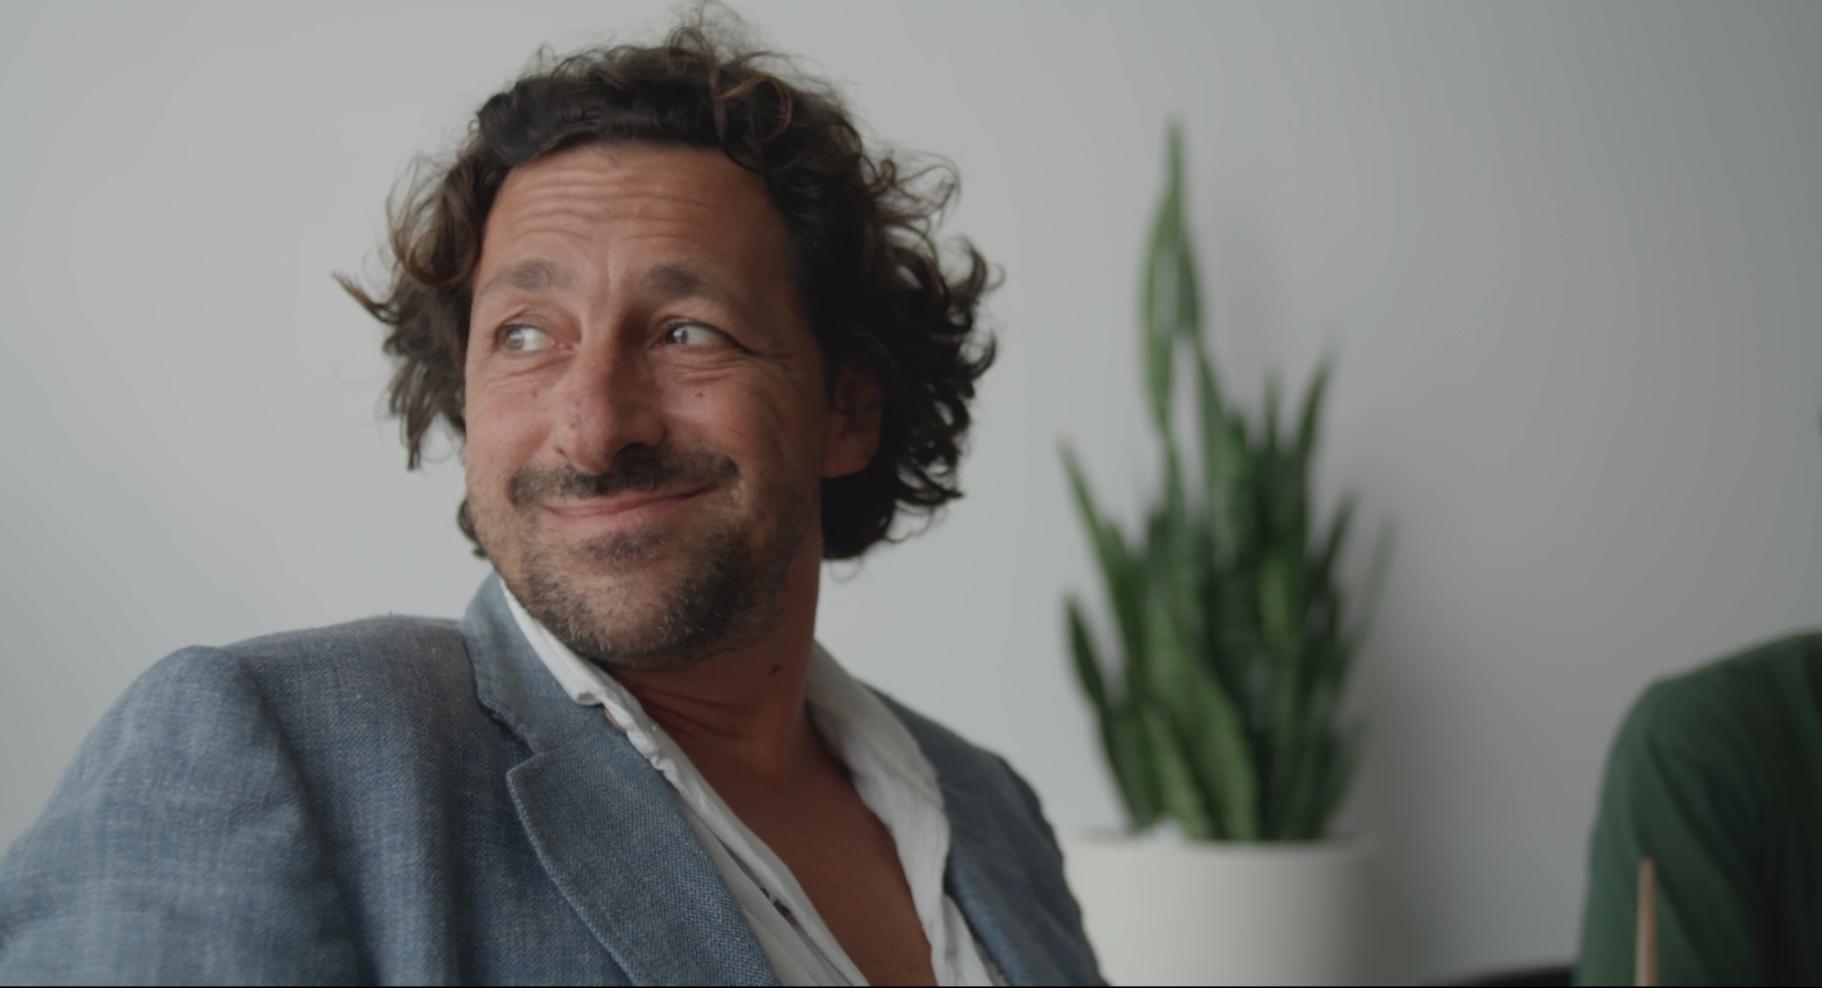 Yari Guglucci as Artistic Director